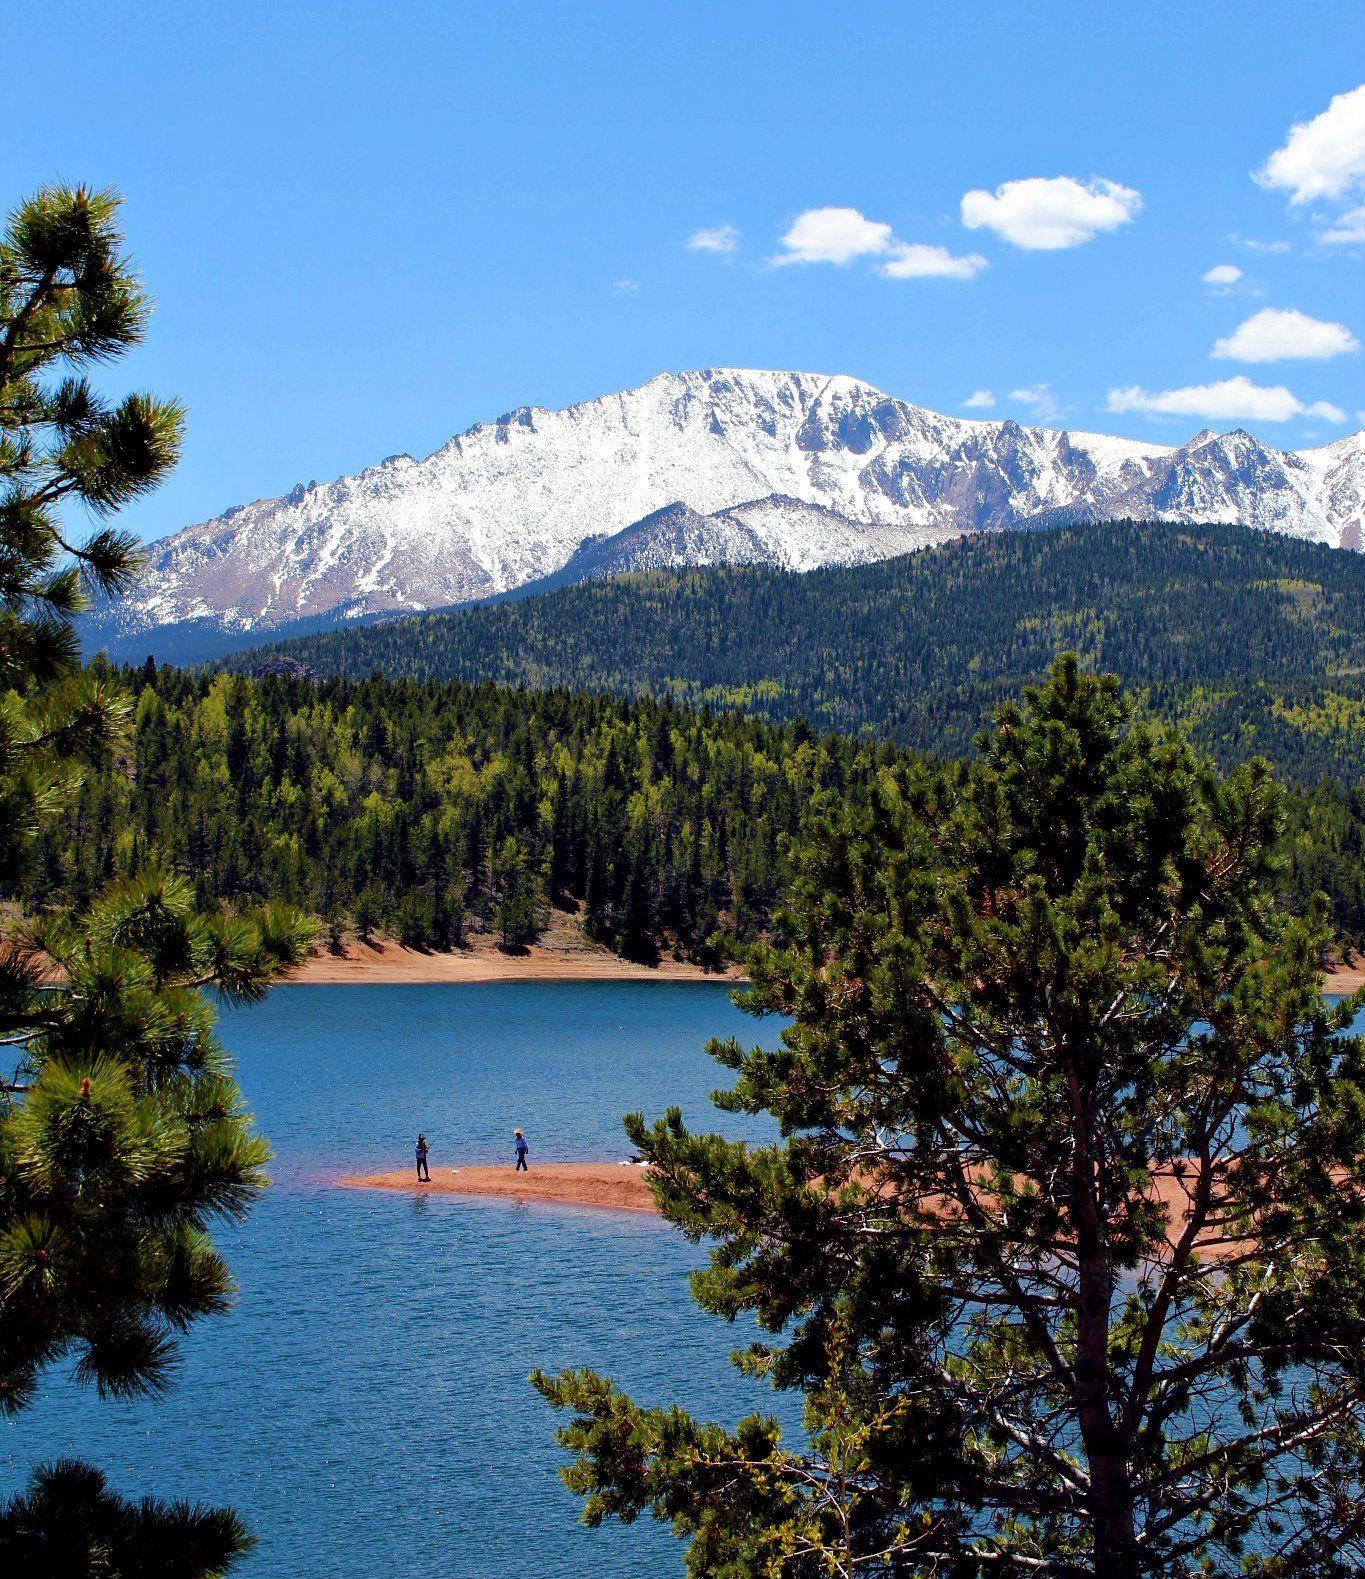 Colorado Springs And: Pikes Peak In Colorado Springs!